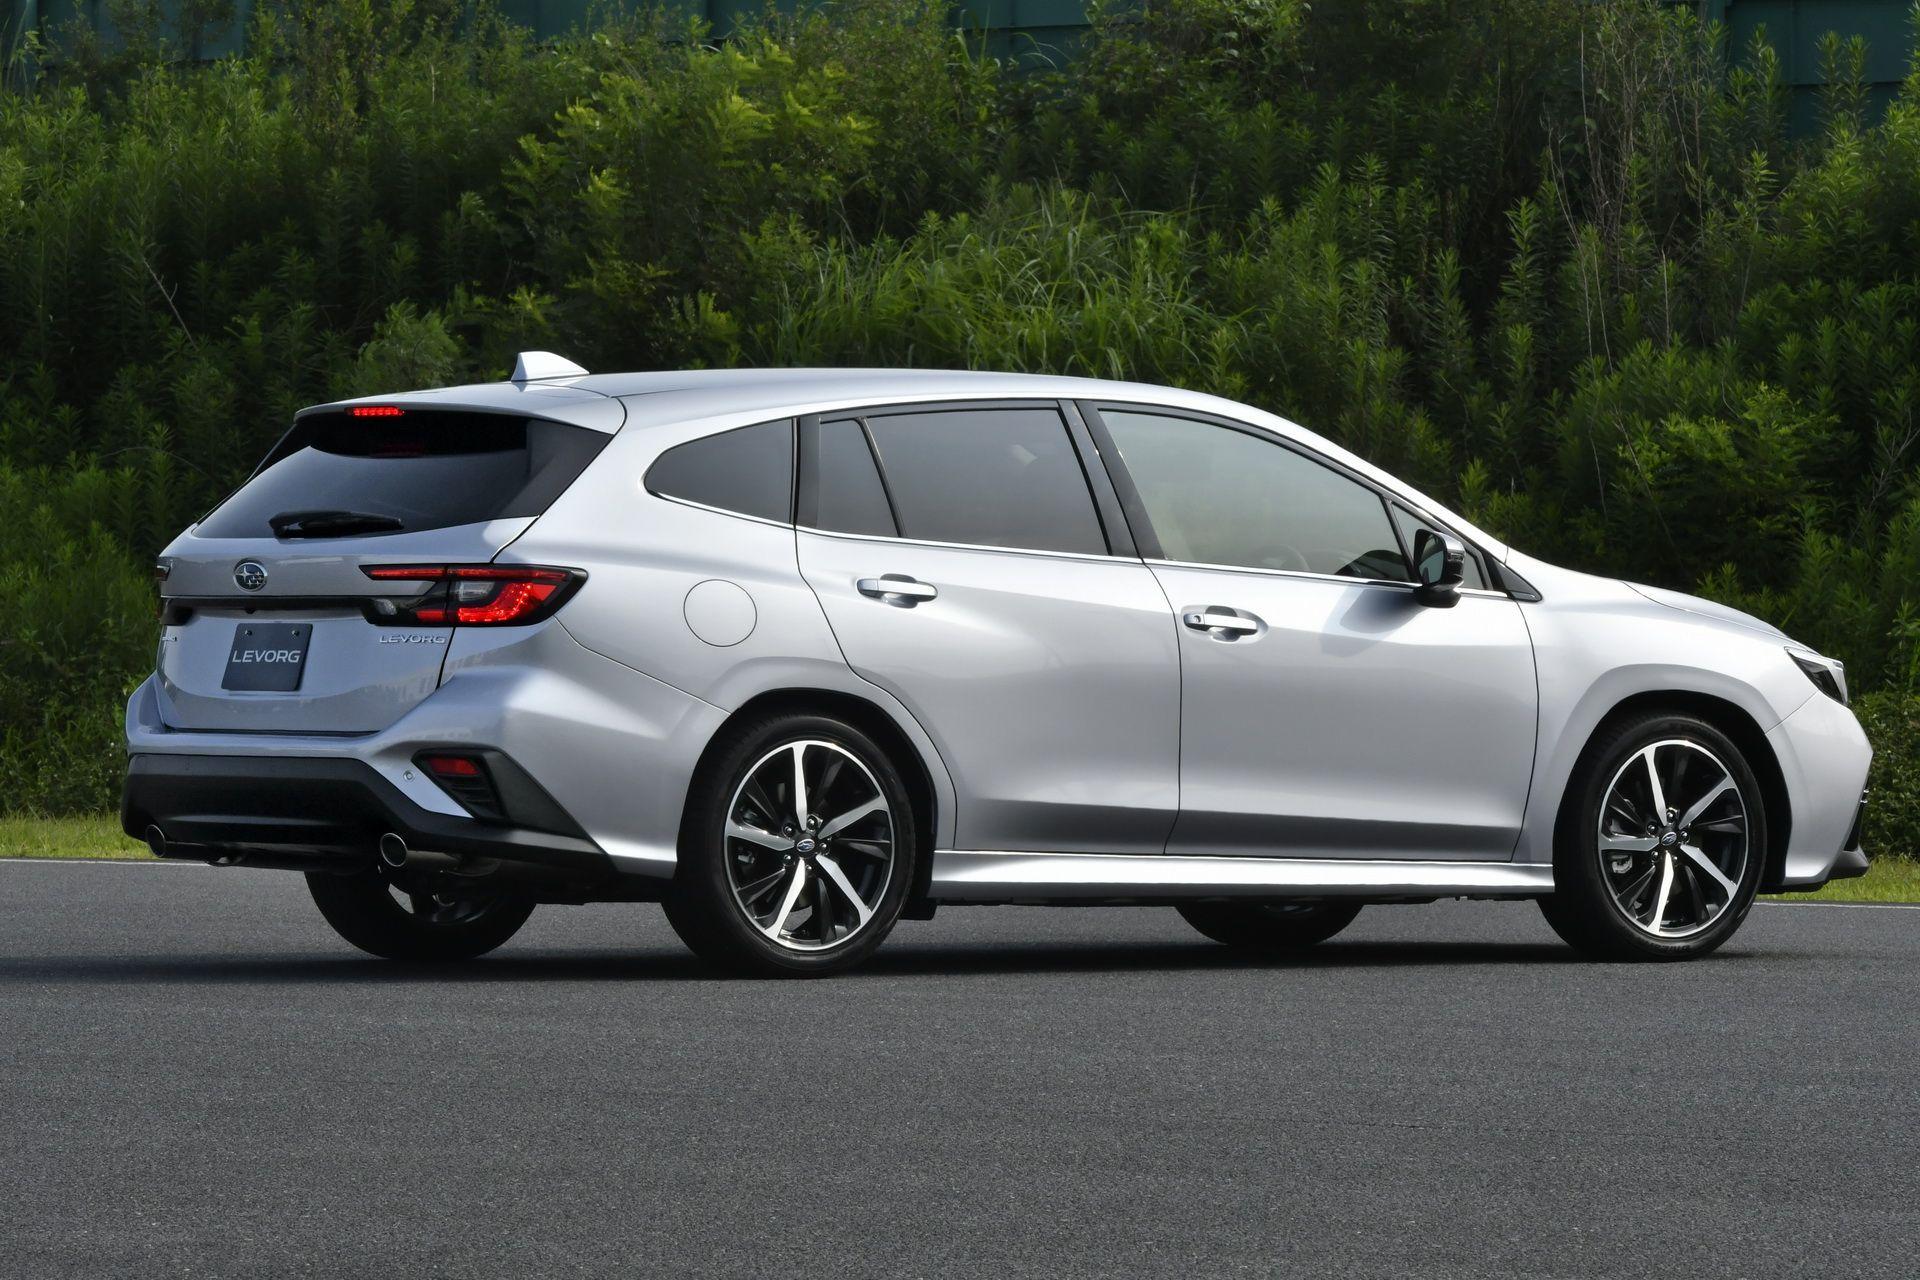 2021_Subaru_Levorg_0040